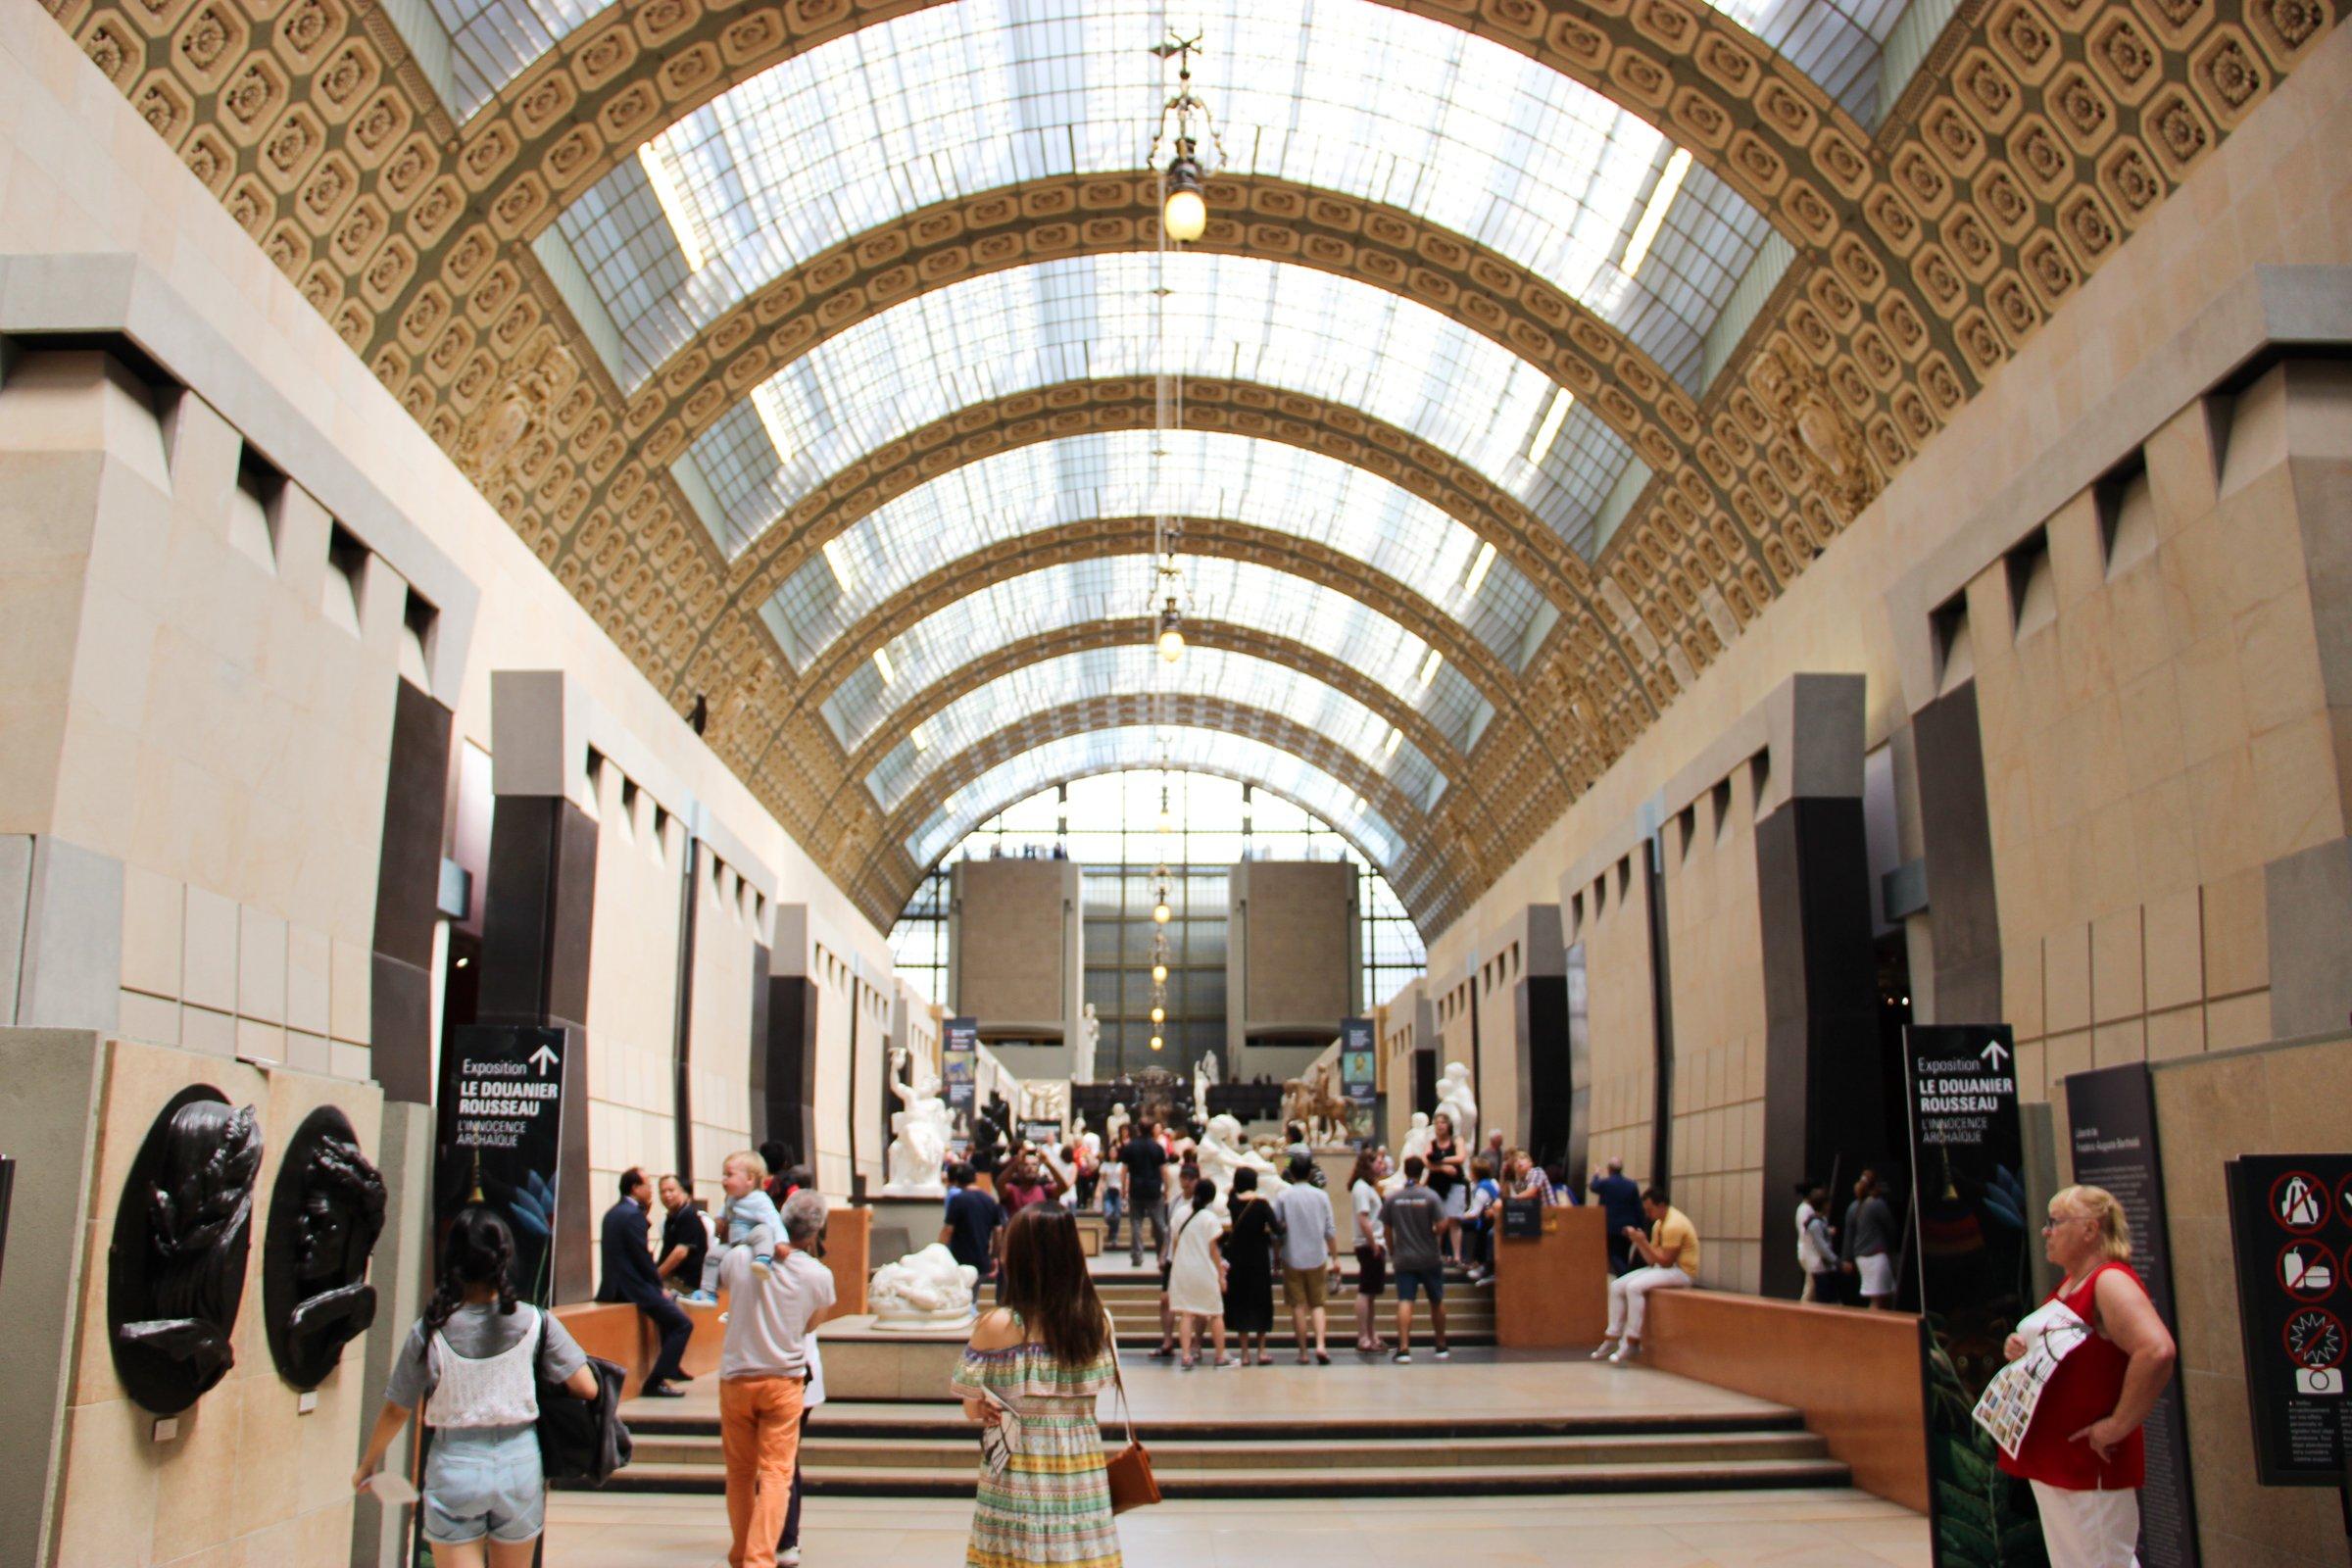 People in Hallway of Museum